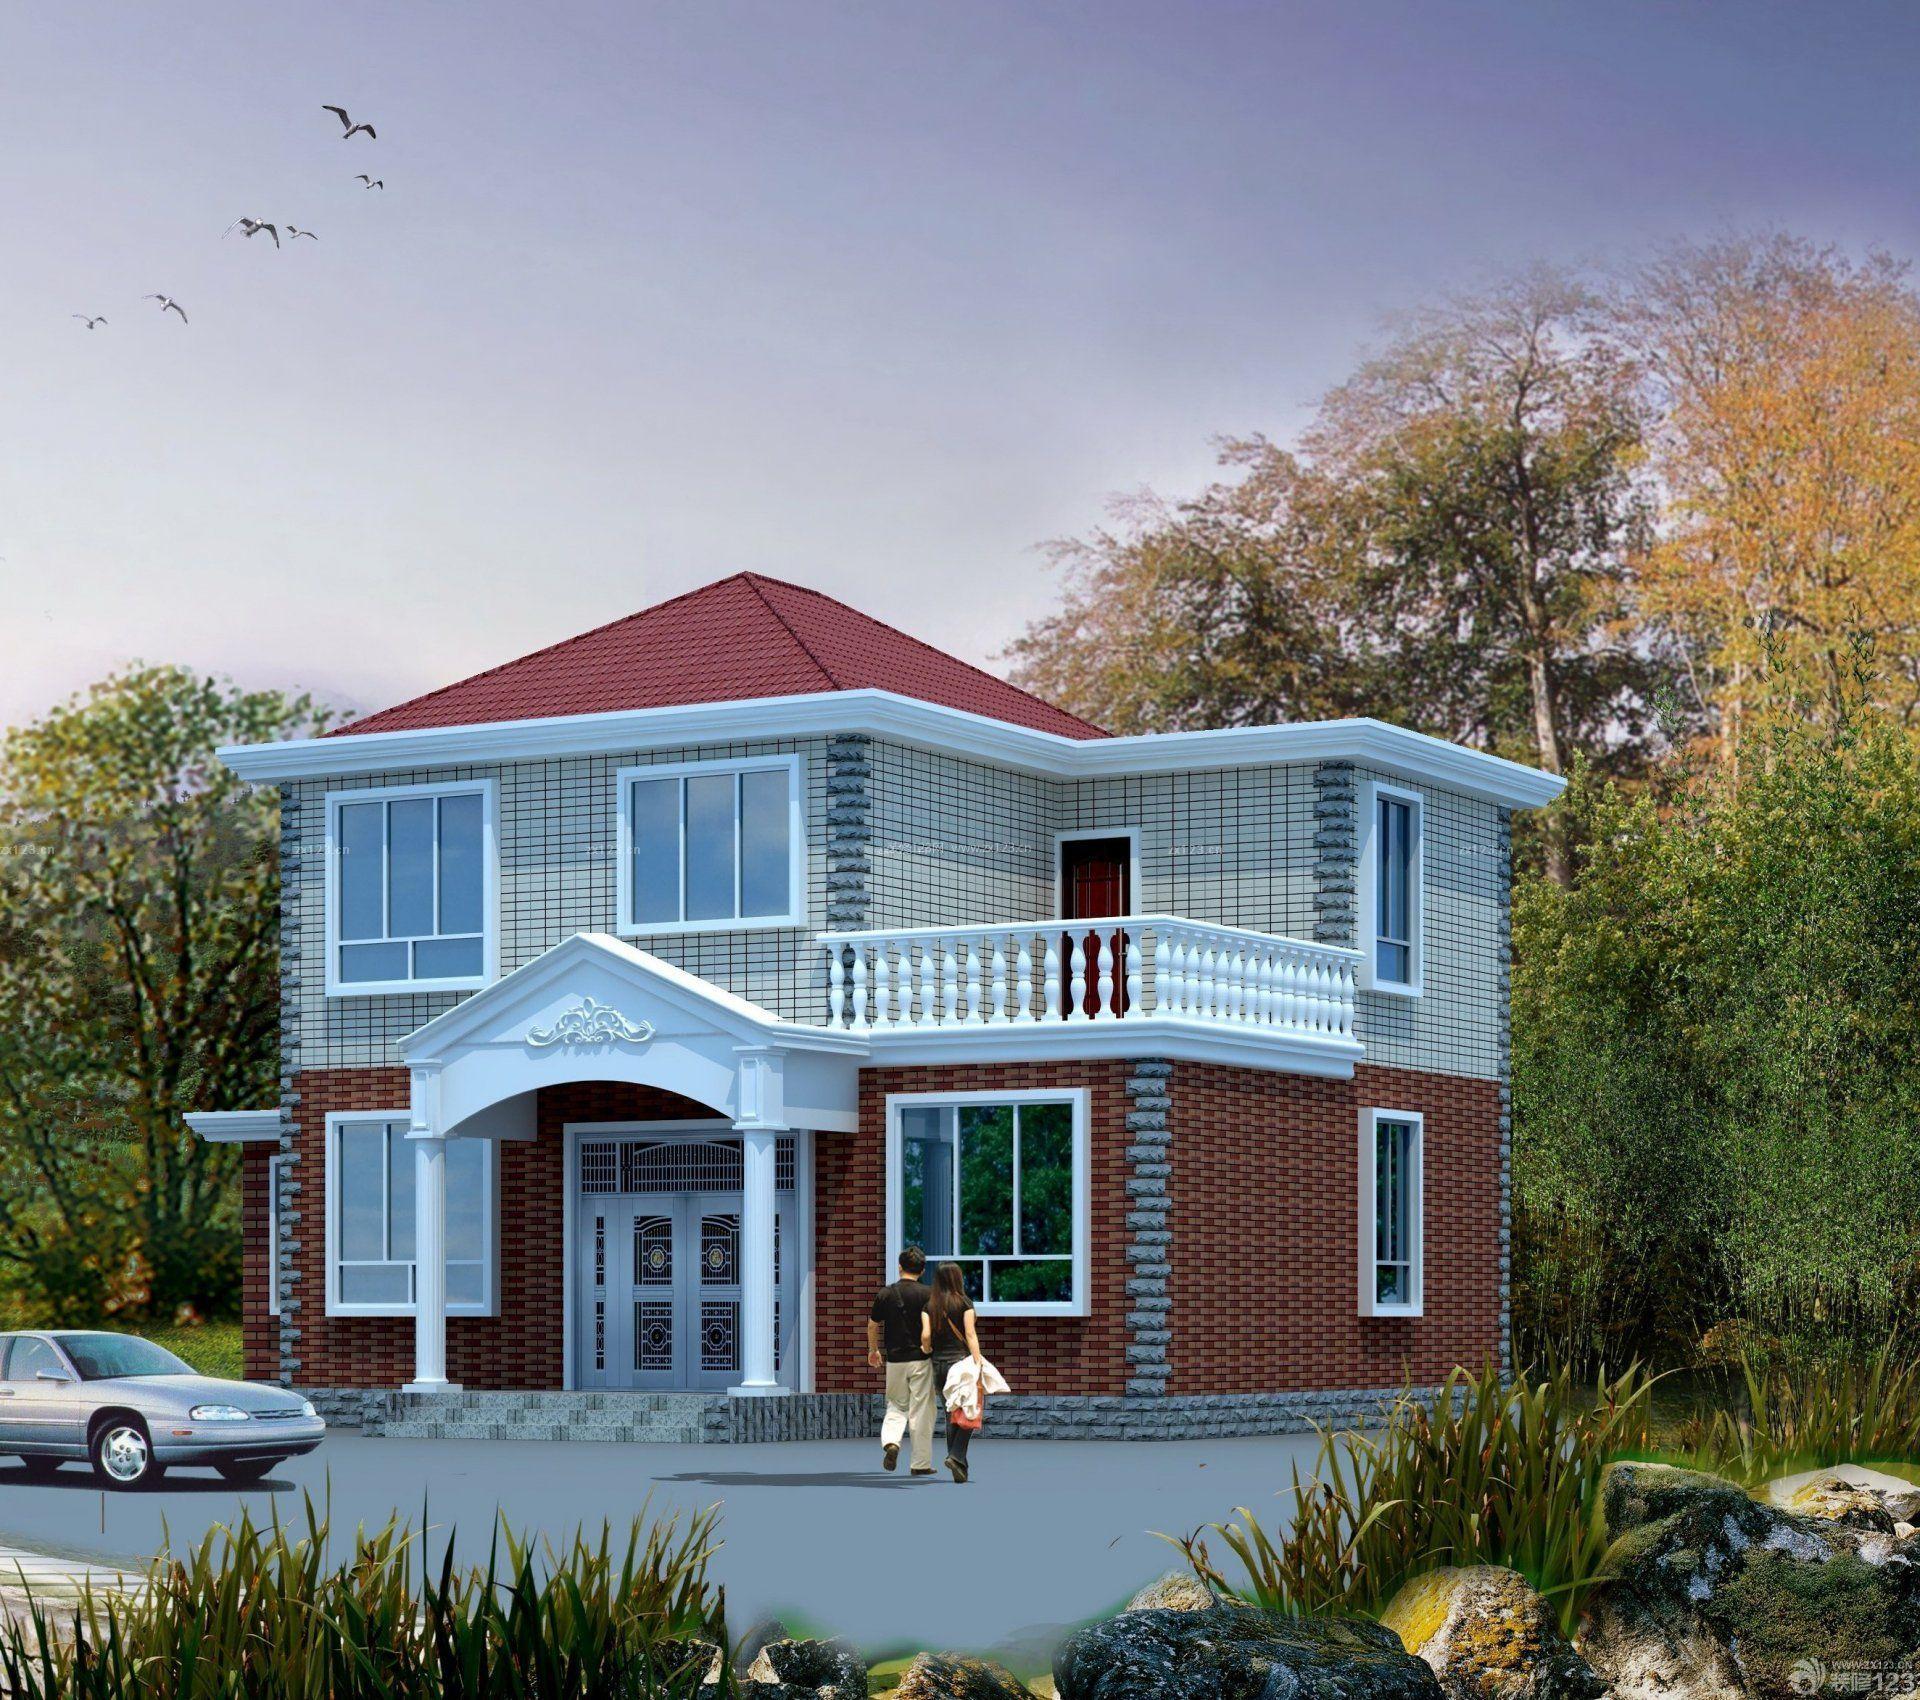 design 农村别墅设计图图片  农村平顶房子图片欣赏-农村15万元二层